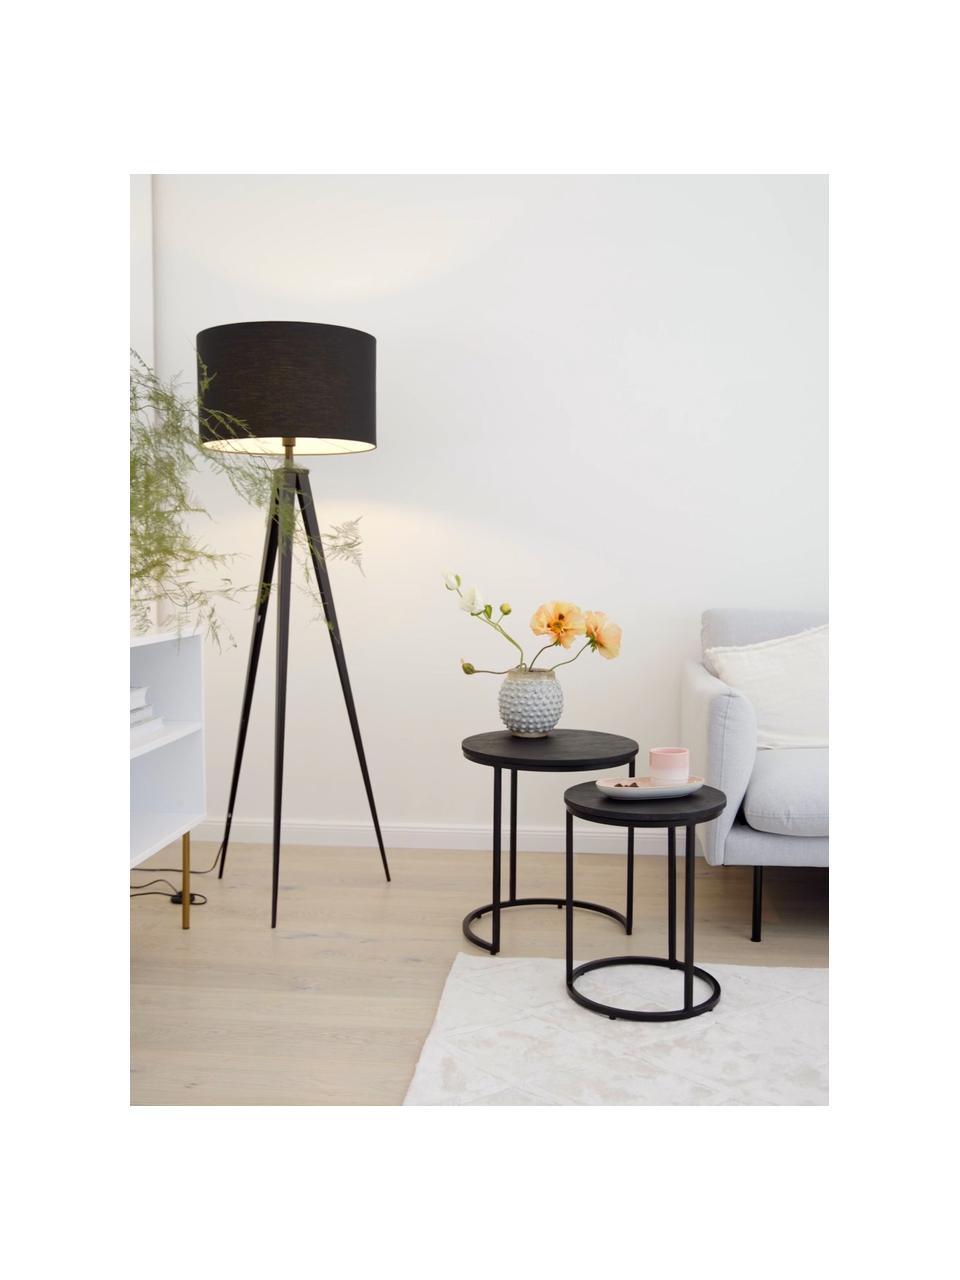 Zwarte bijzettafelset Andrew, 2-delig, Frame: gepoedercoat metaal, Tafelblad: zwart gelakt mangohout. Frame: mat zwart, Verschillende formaten